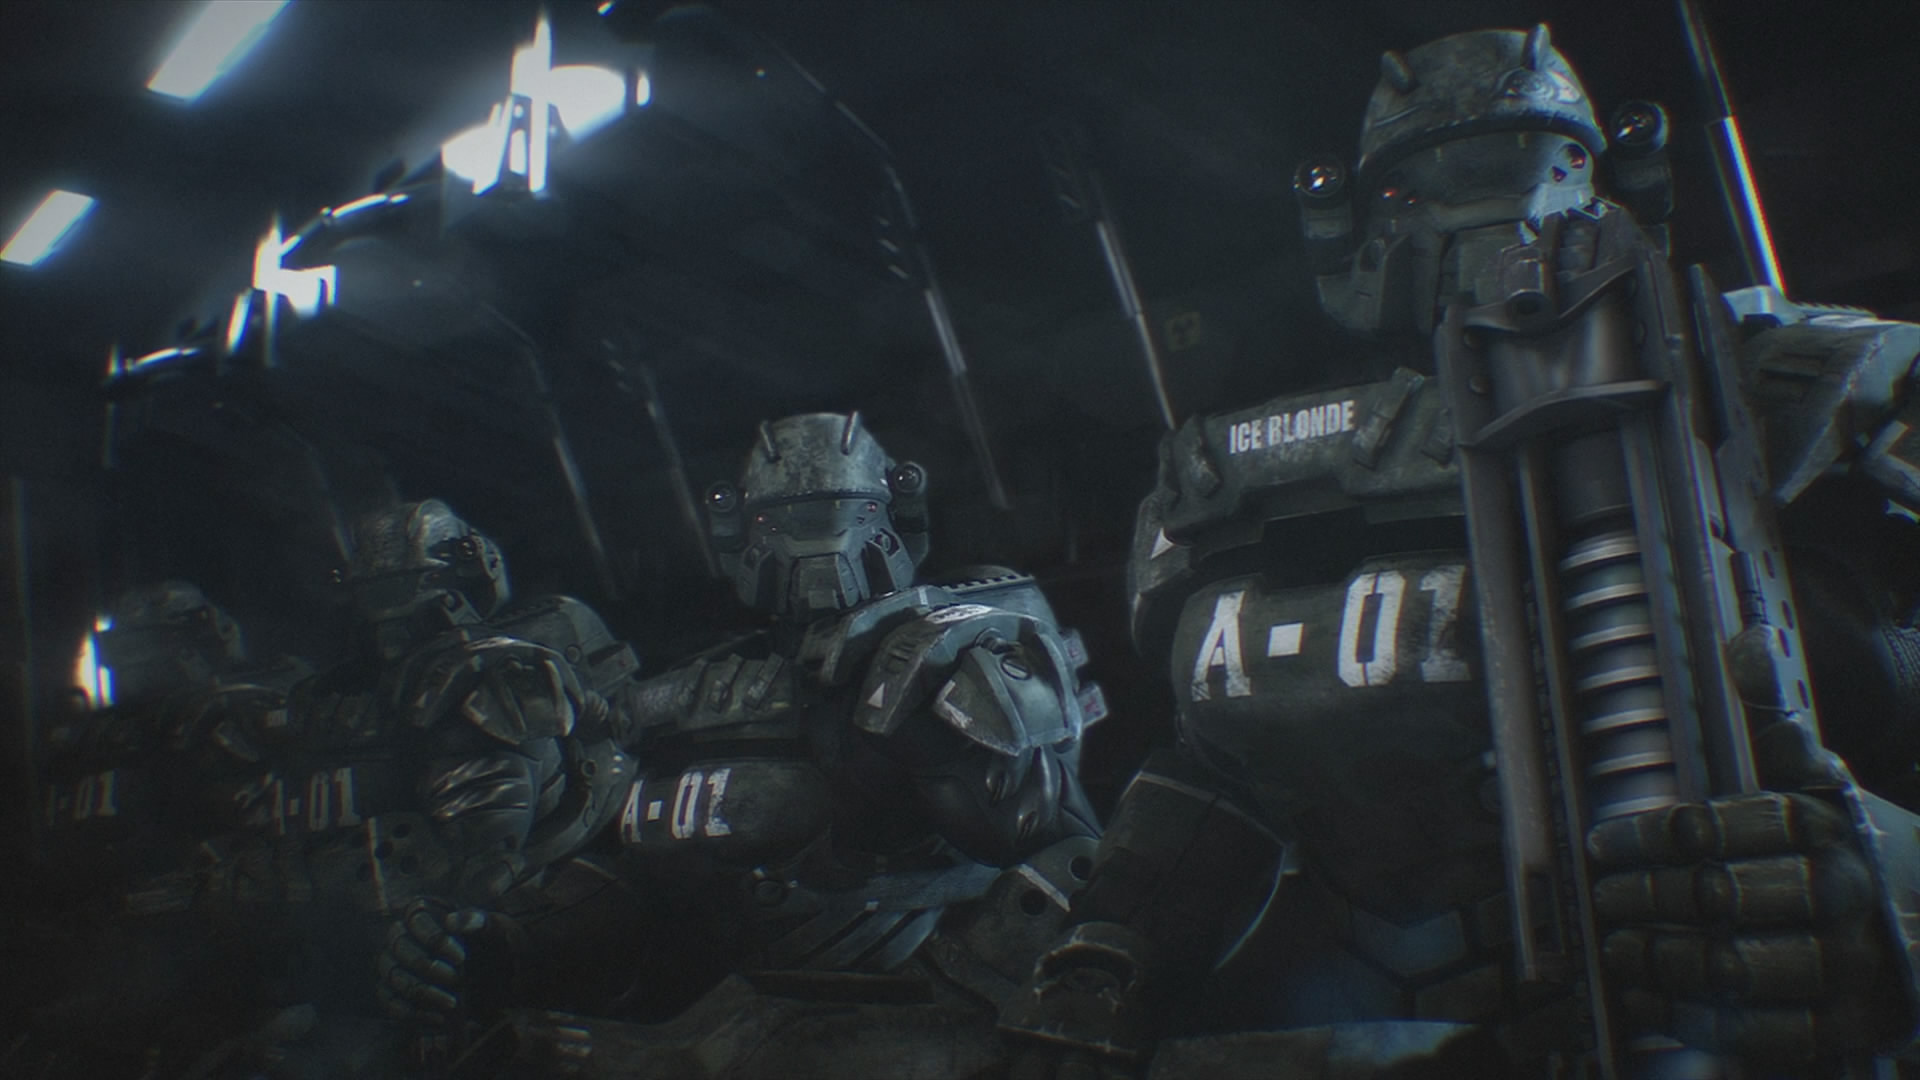 Image - Sti-iceblonde-film-1.jpg | Starship Troopers Wiki ...